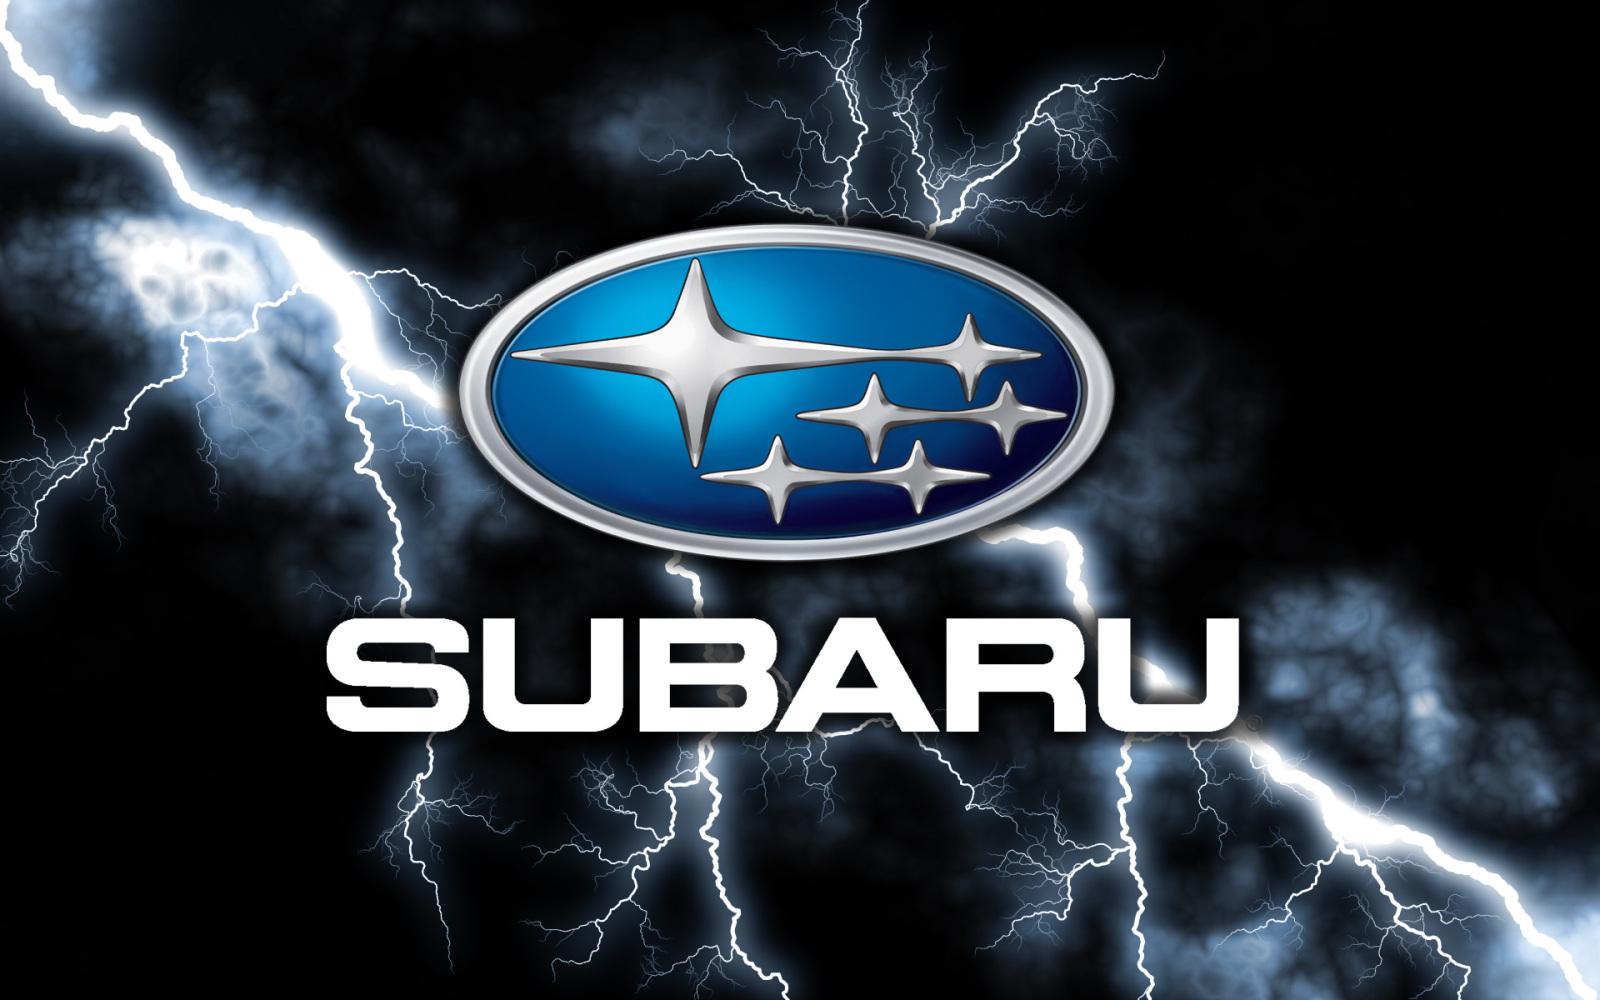 Subaru symbol Wallpaper